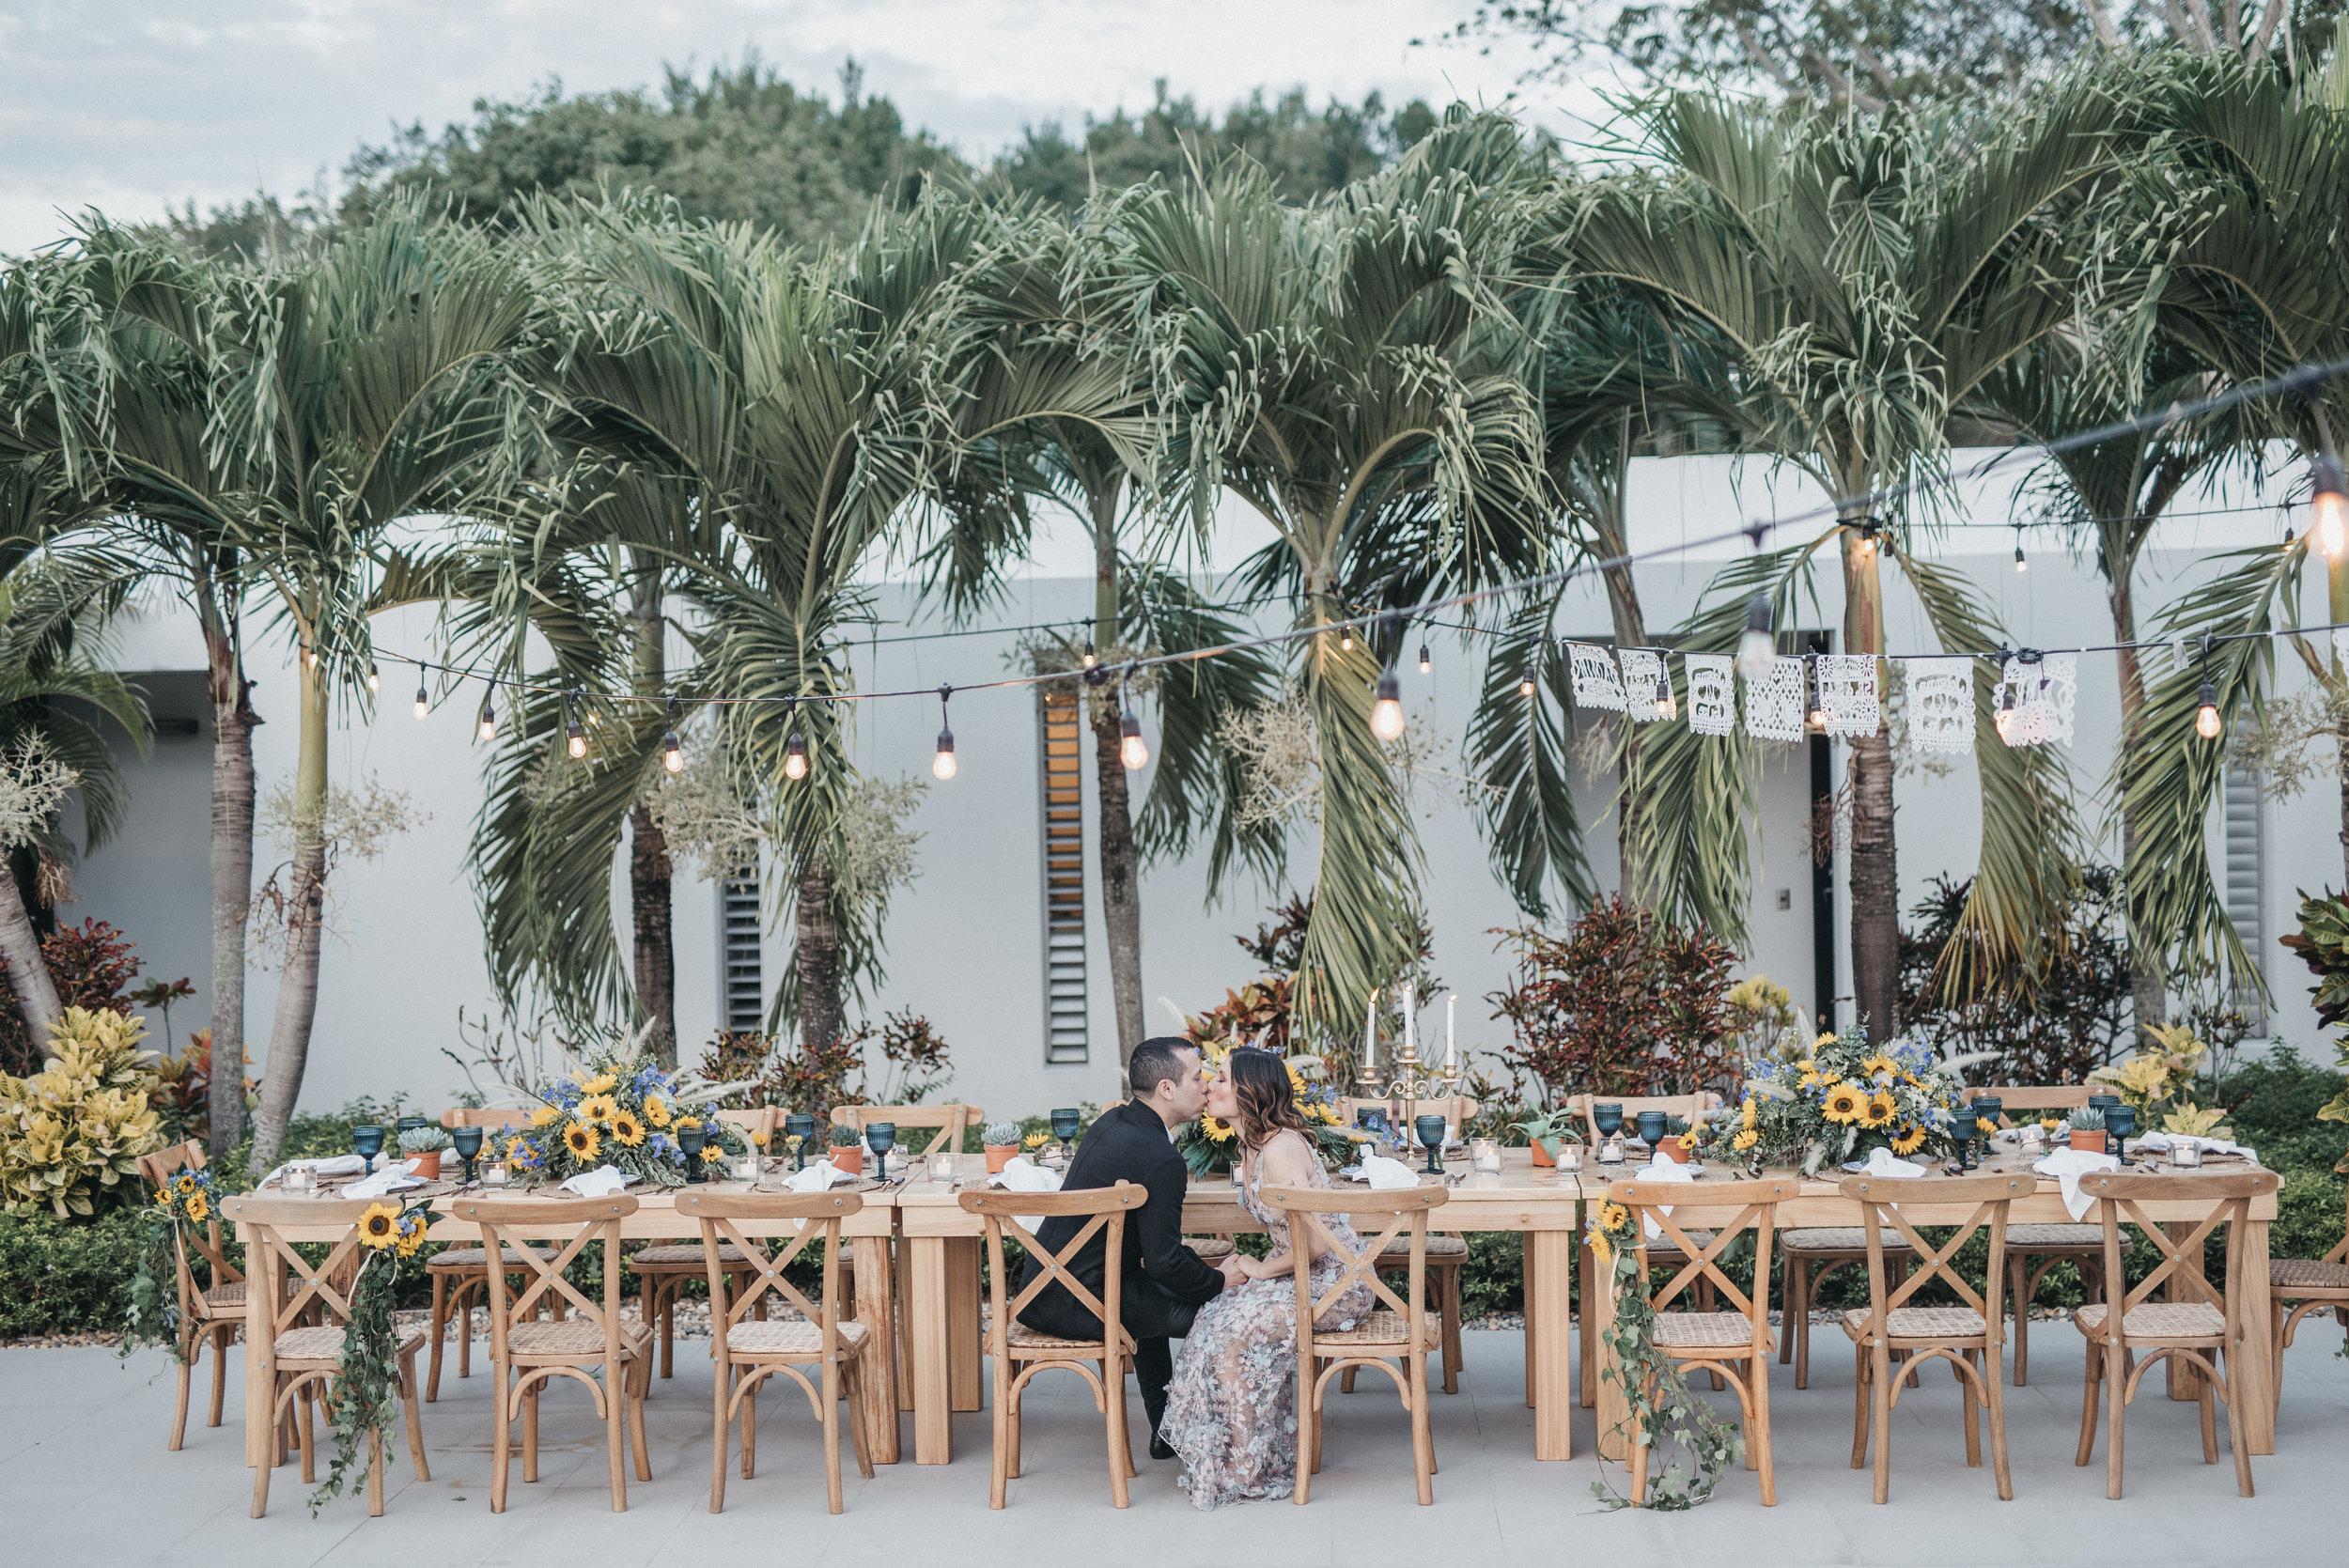 Julieth-bravo-weddingplanner-matrimonio-aniversario-destino-colombia-boda-destination-wedding-love-dinner-intimated-celebration.jpg